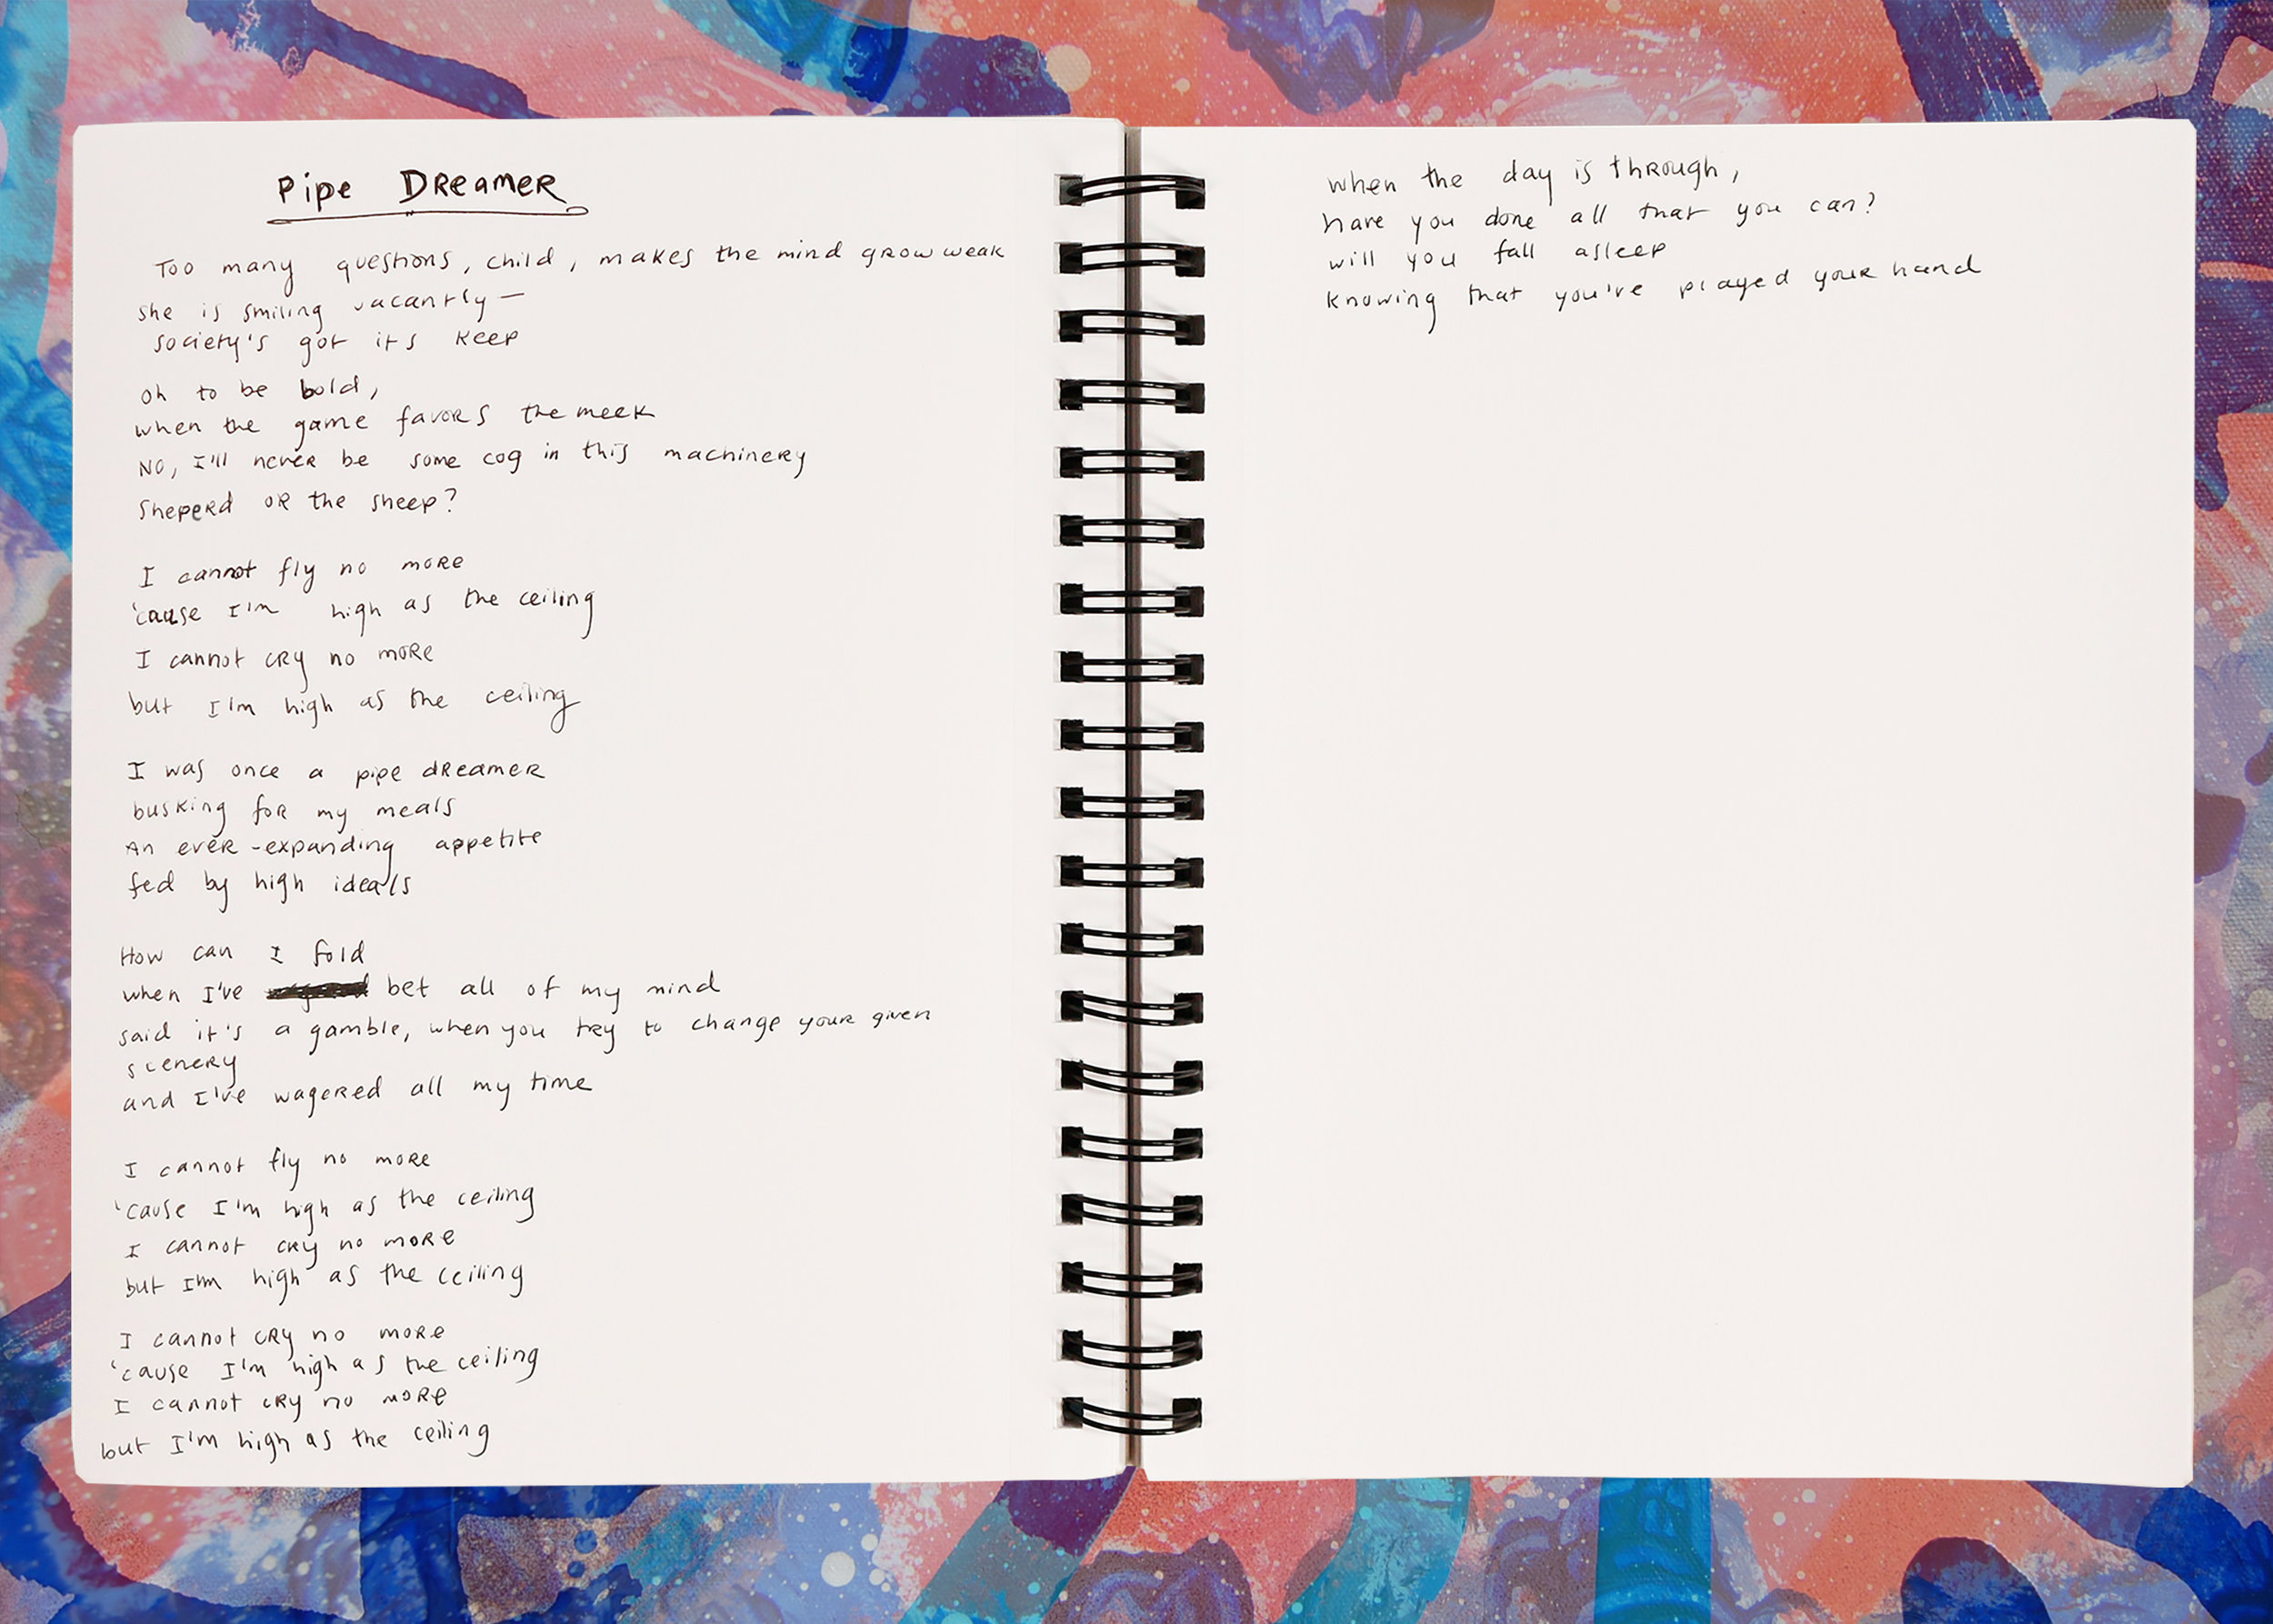 Pipe Dreamer Lyrics bigger.jpg